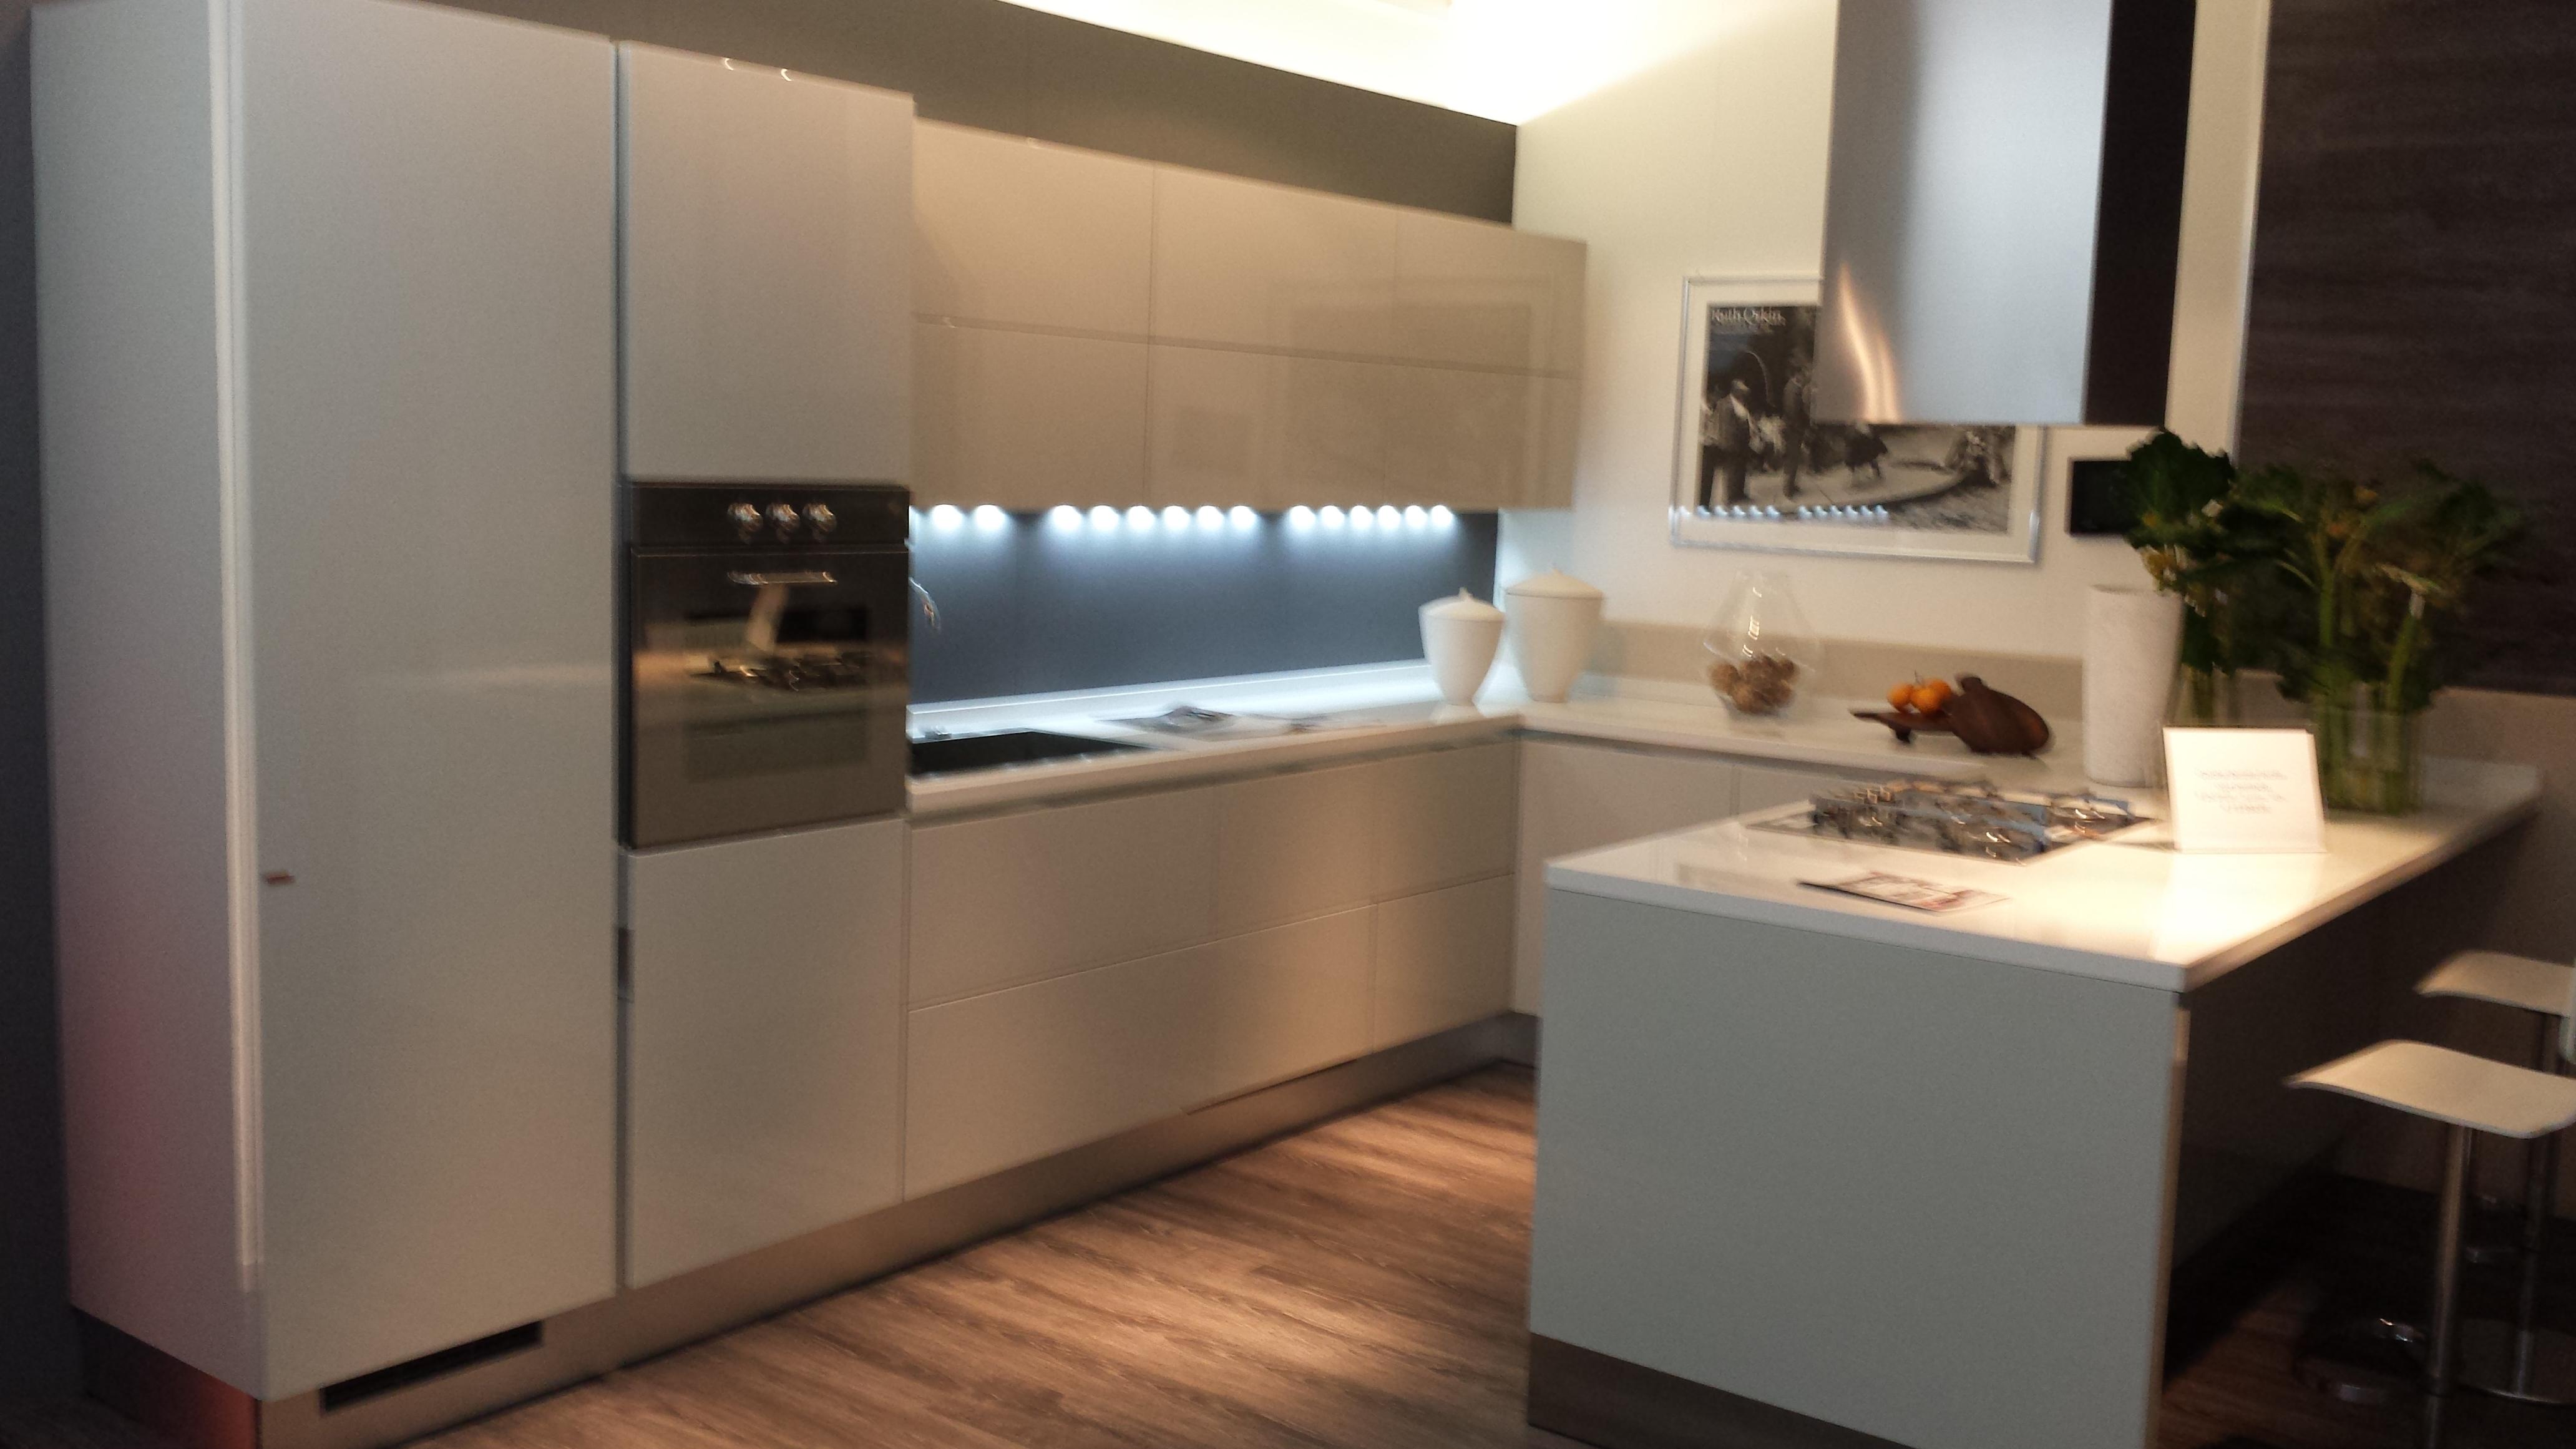 Mobili Ikea Opinioni - Modelos De Casas - Justrigs.com